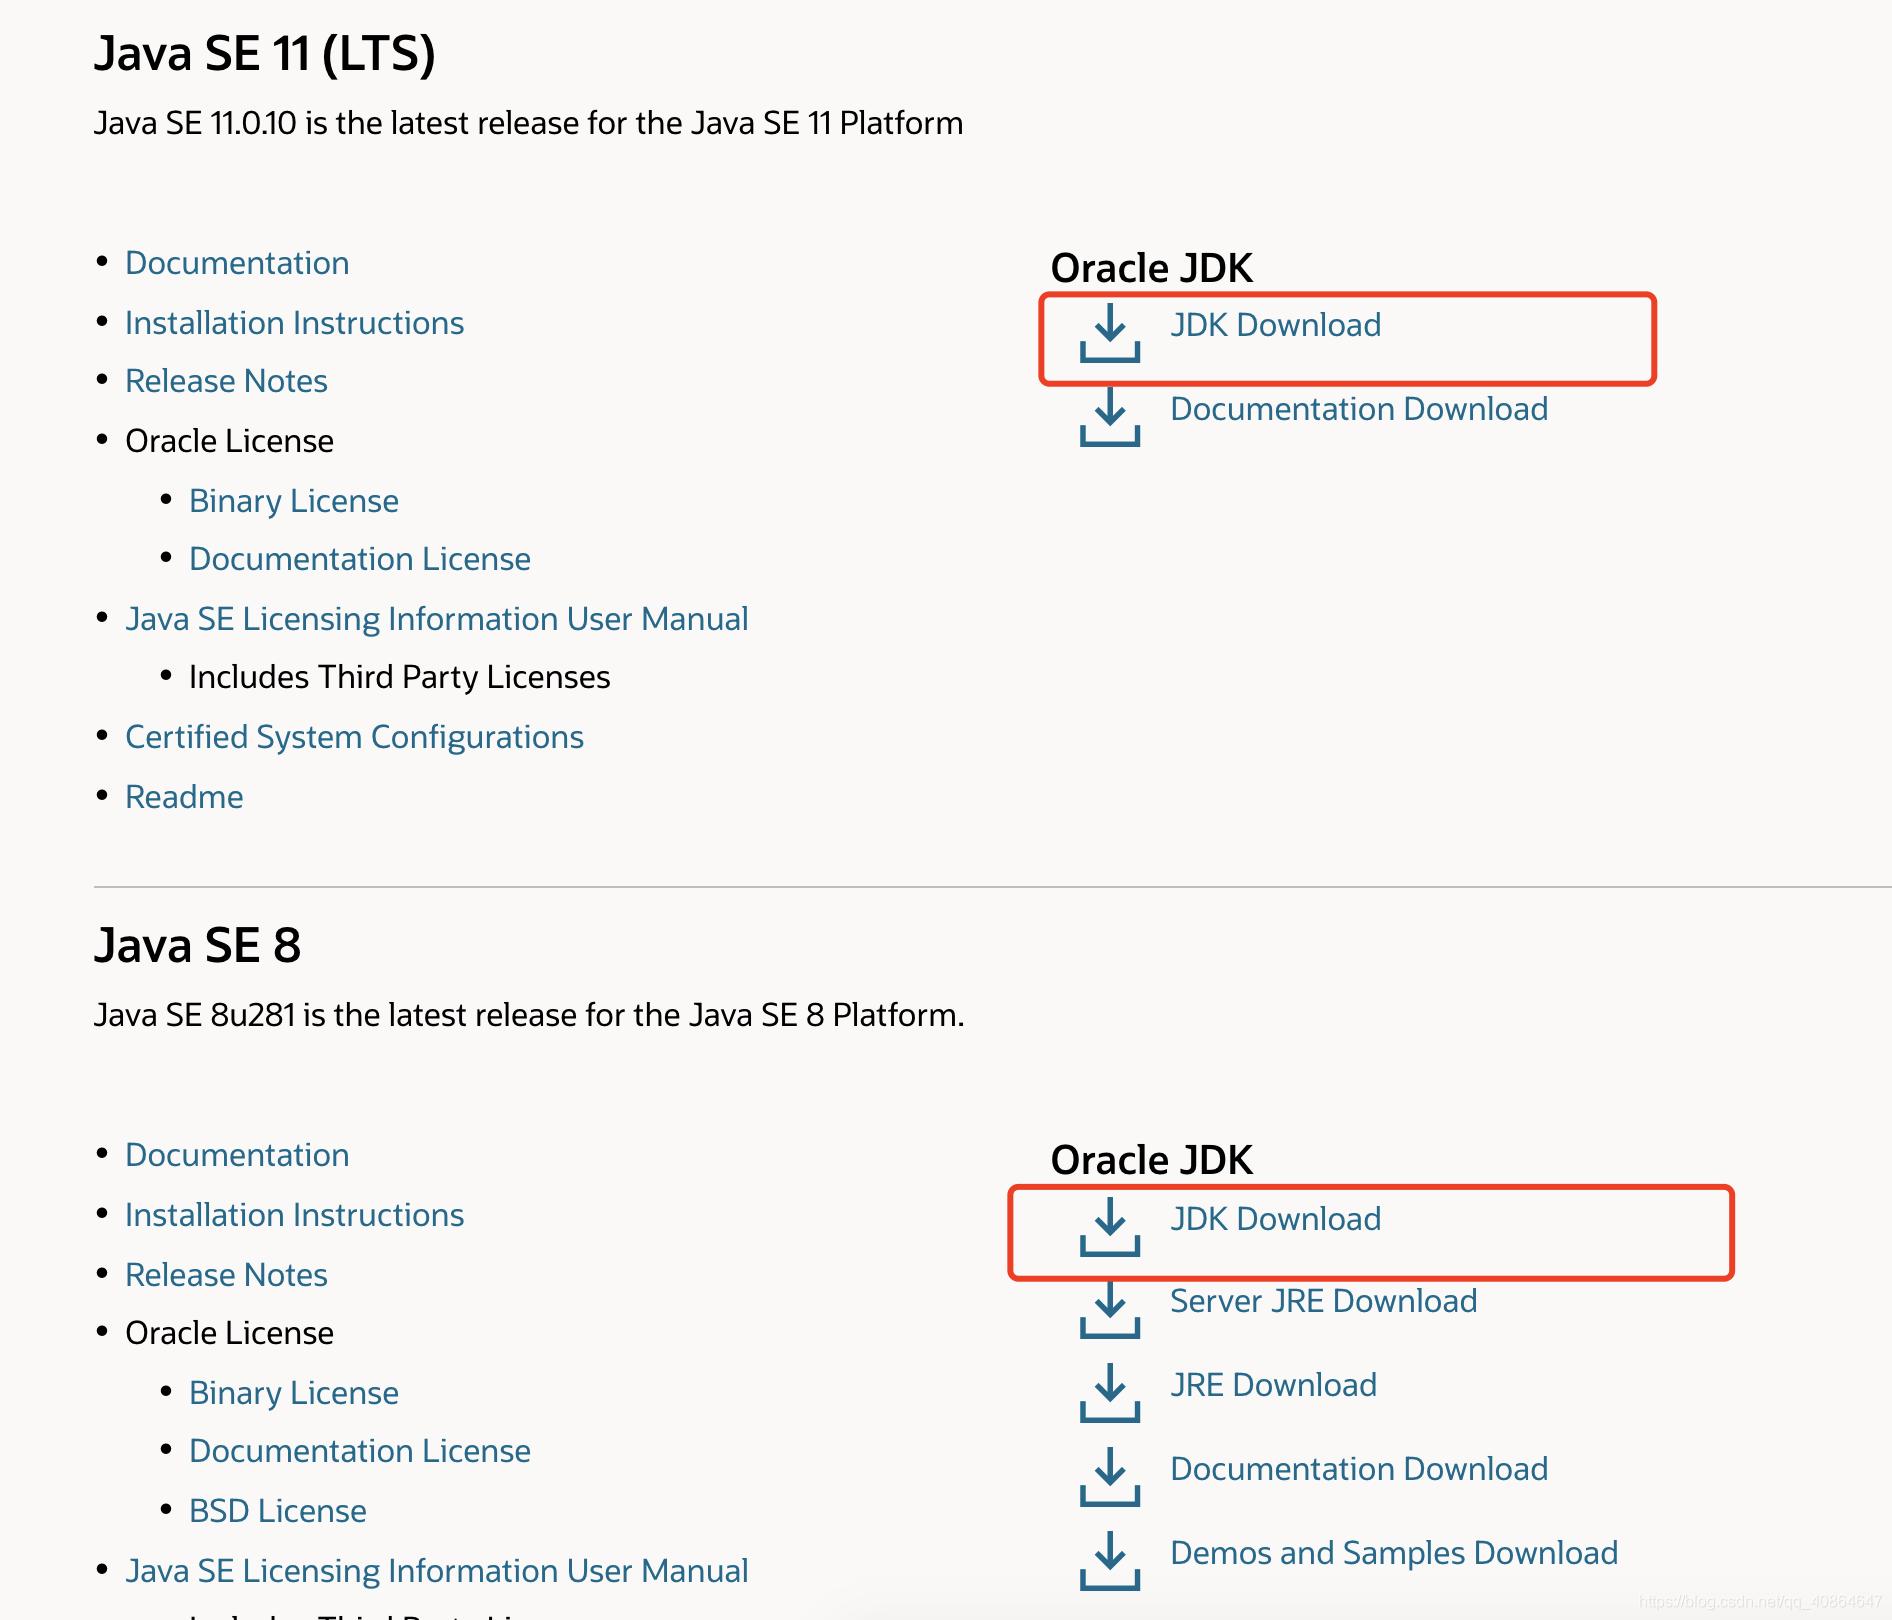 [外链图片转存失败,源站可能有防盗链机制,建议将图片保存下来直接上传(img-WxFJAwDP-1618415456185)(/Users/2q/Library/Application Support/typora-user-images/image-20210414231424723.png)]